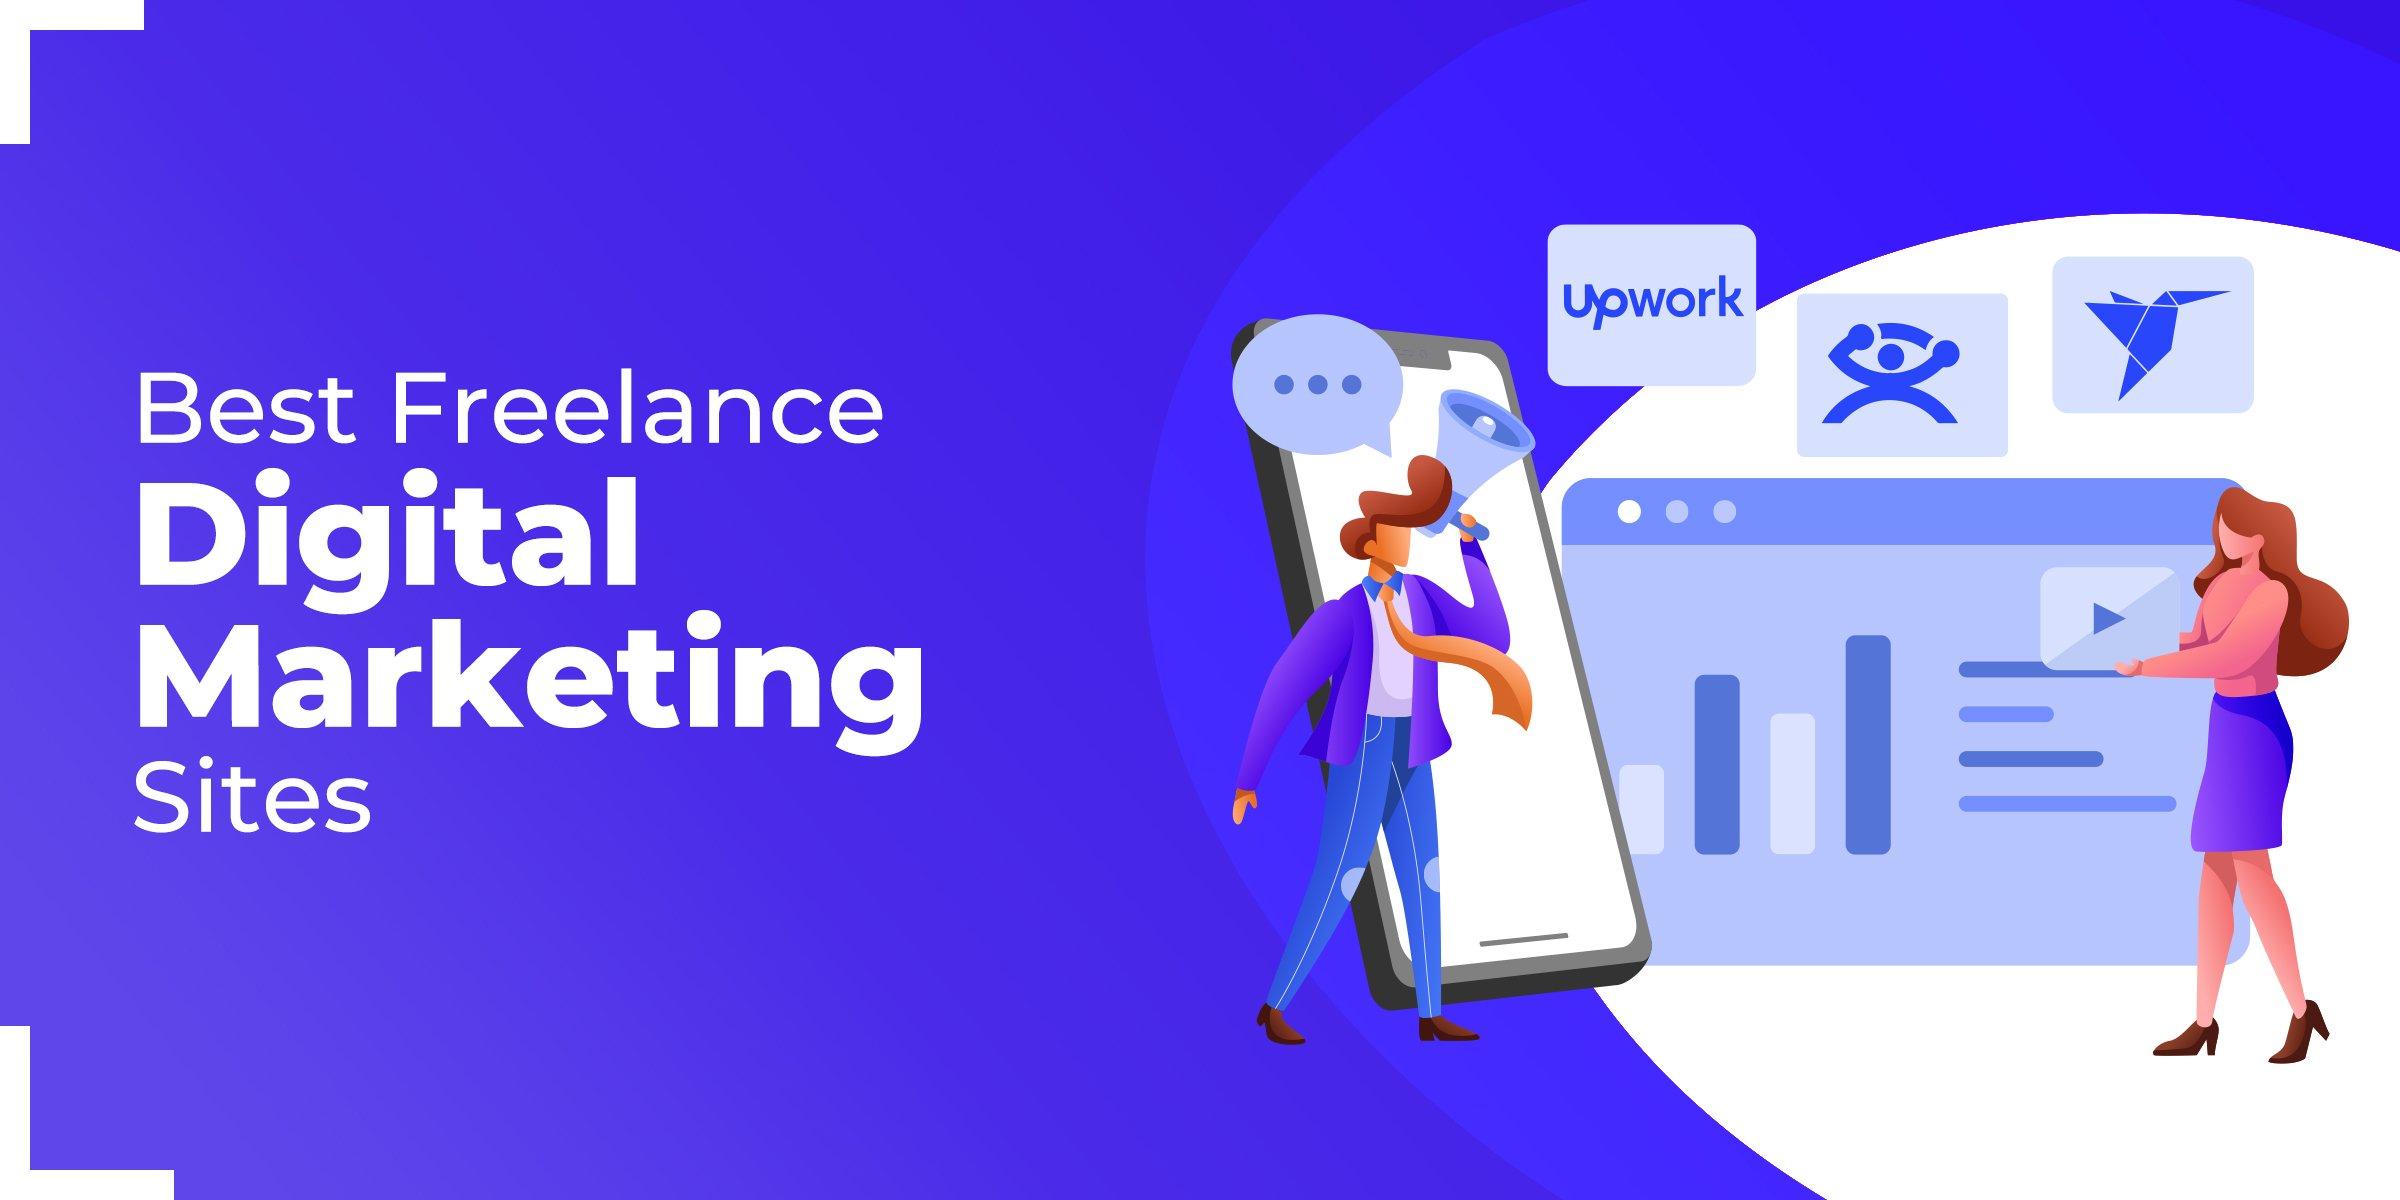 Best Freelance Digital Marketing Websites